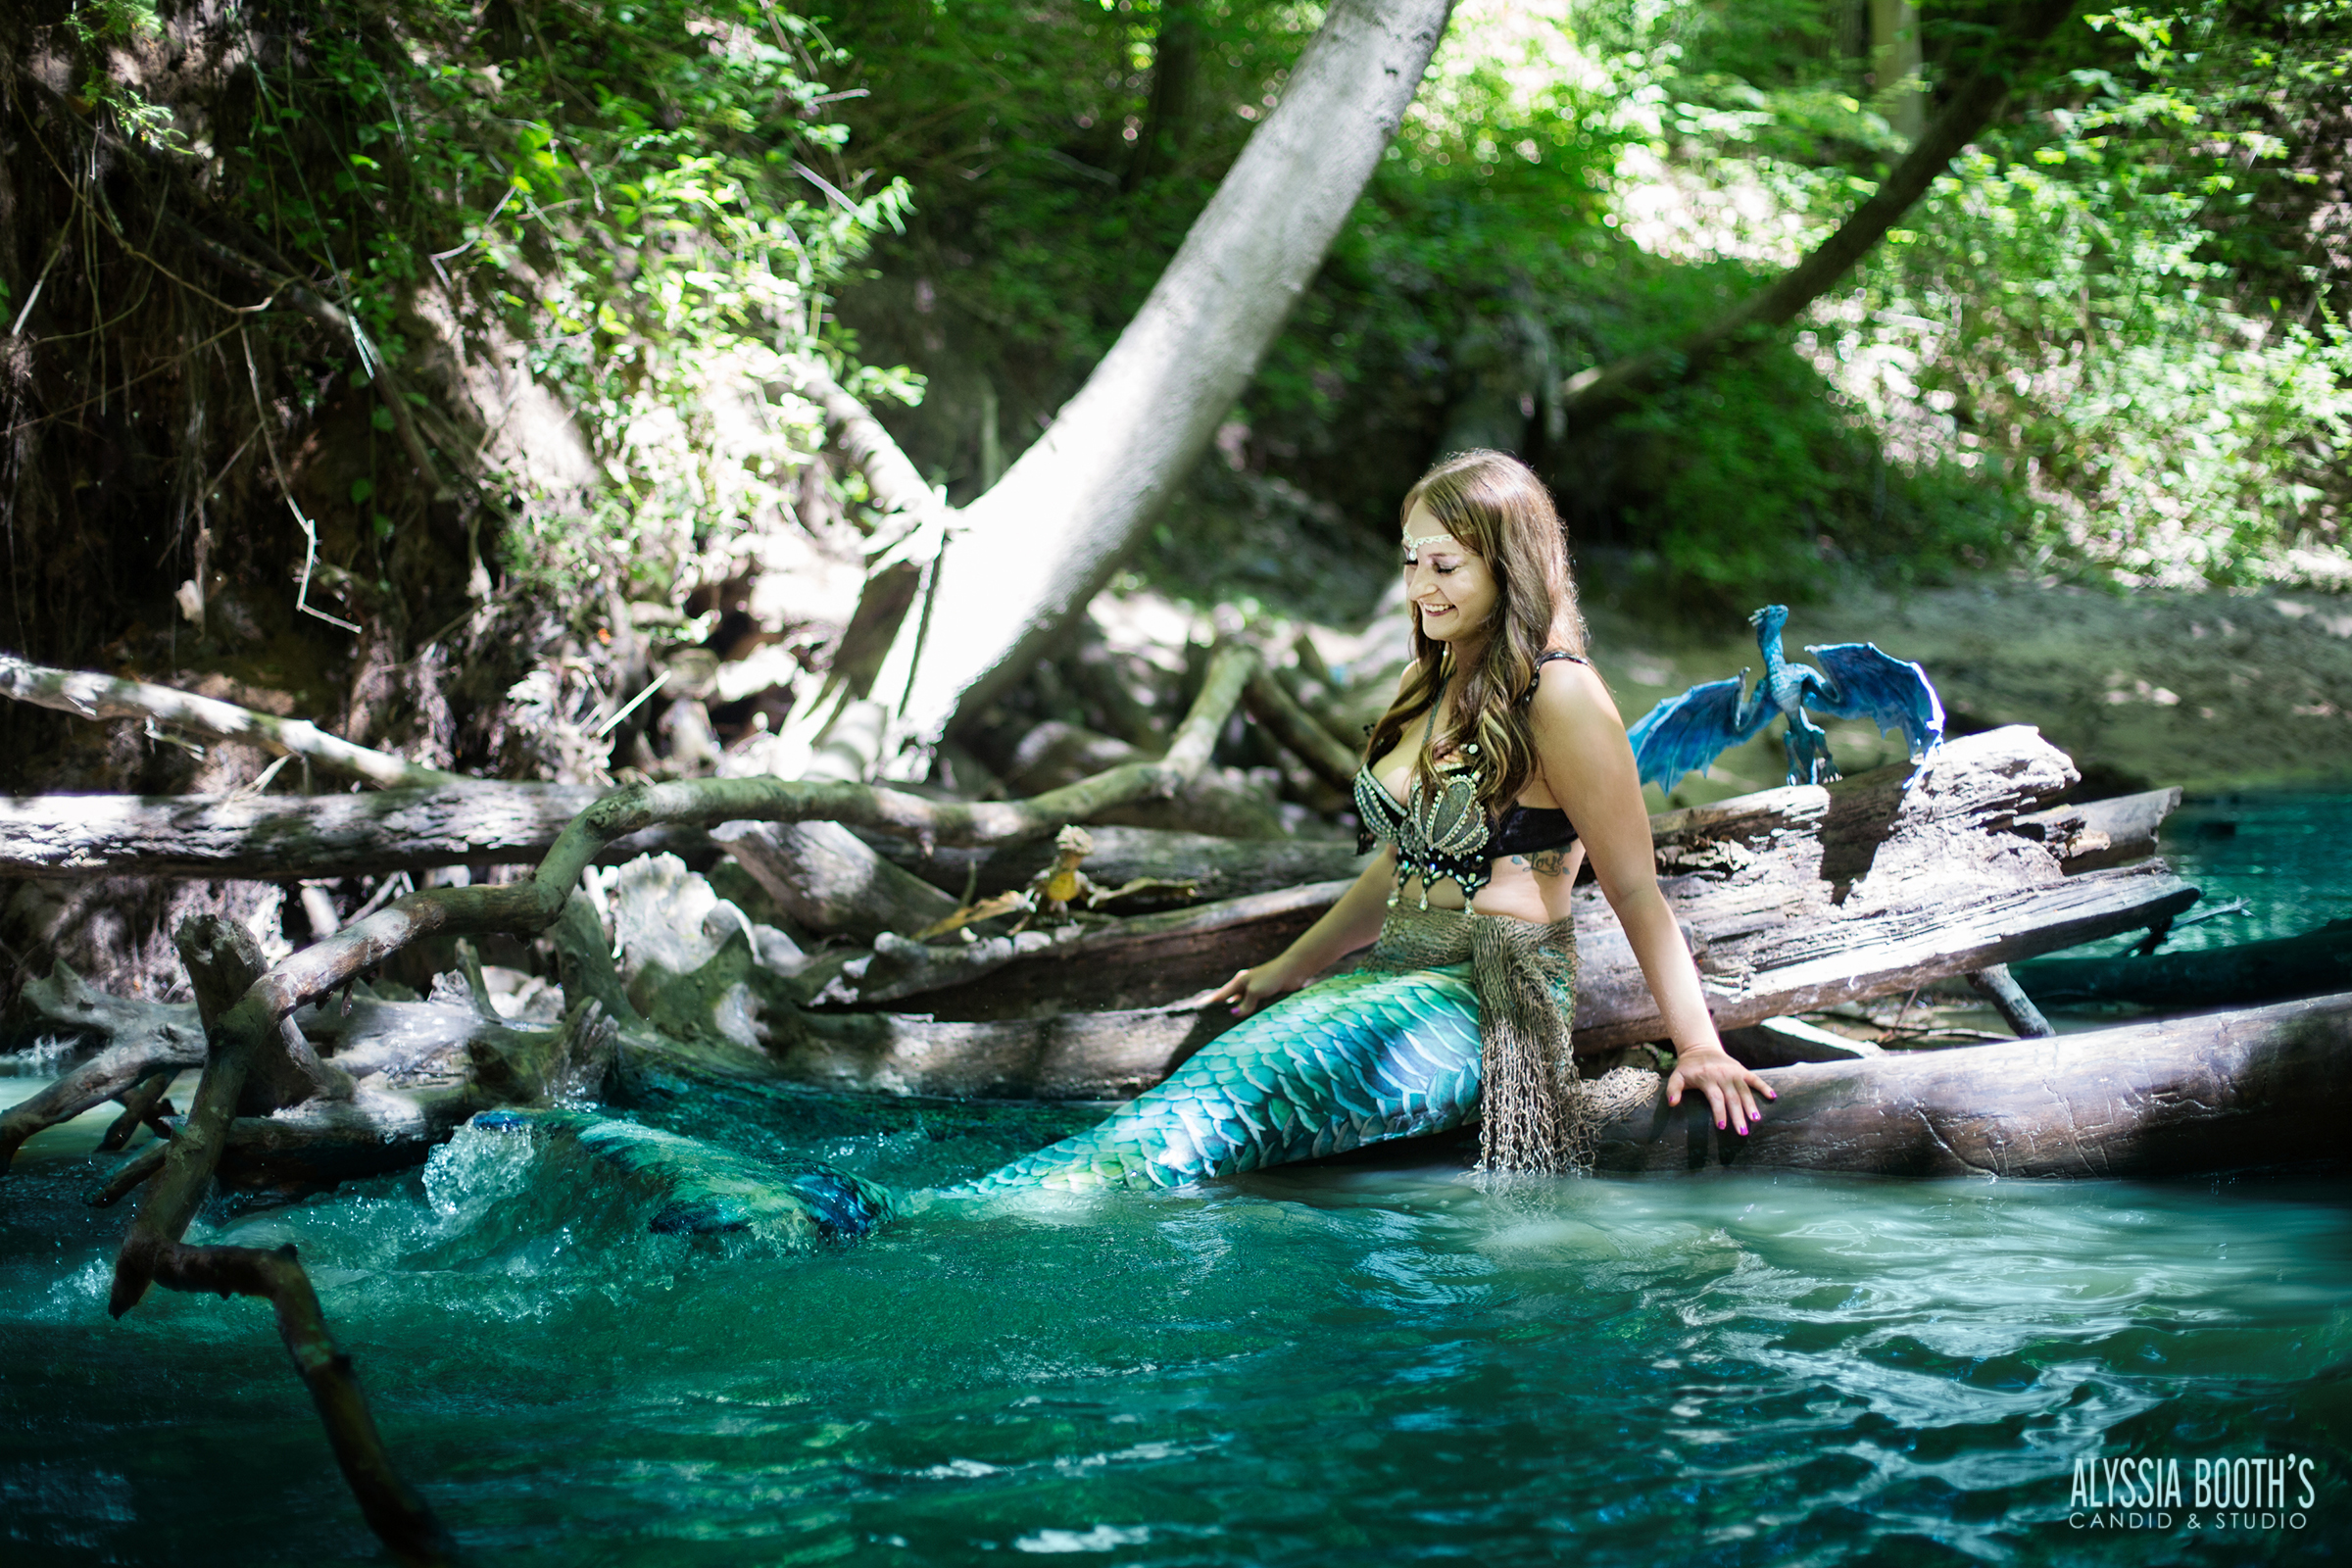 Splash | Dragon & Mermaid | Mermaid Photoshoot | Be The Myth | Alyssia Booth's Candid & Studio | Michigan Photographer | Fantasy Shoots | www.abcandidstudio.com